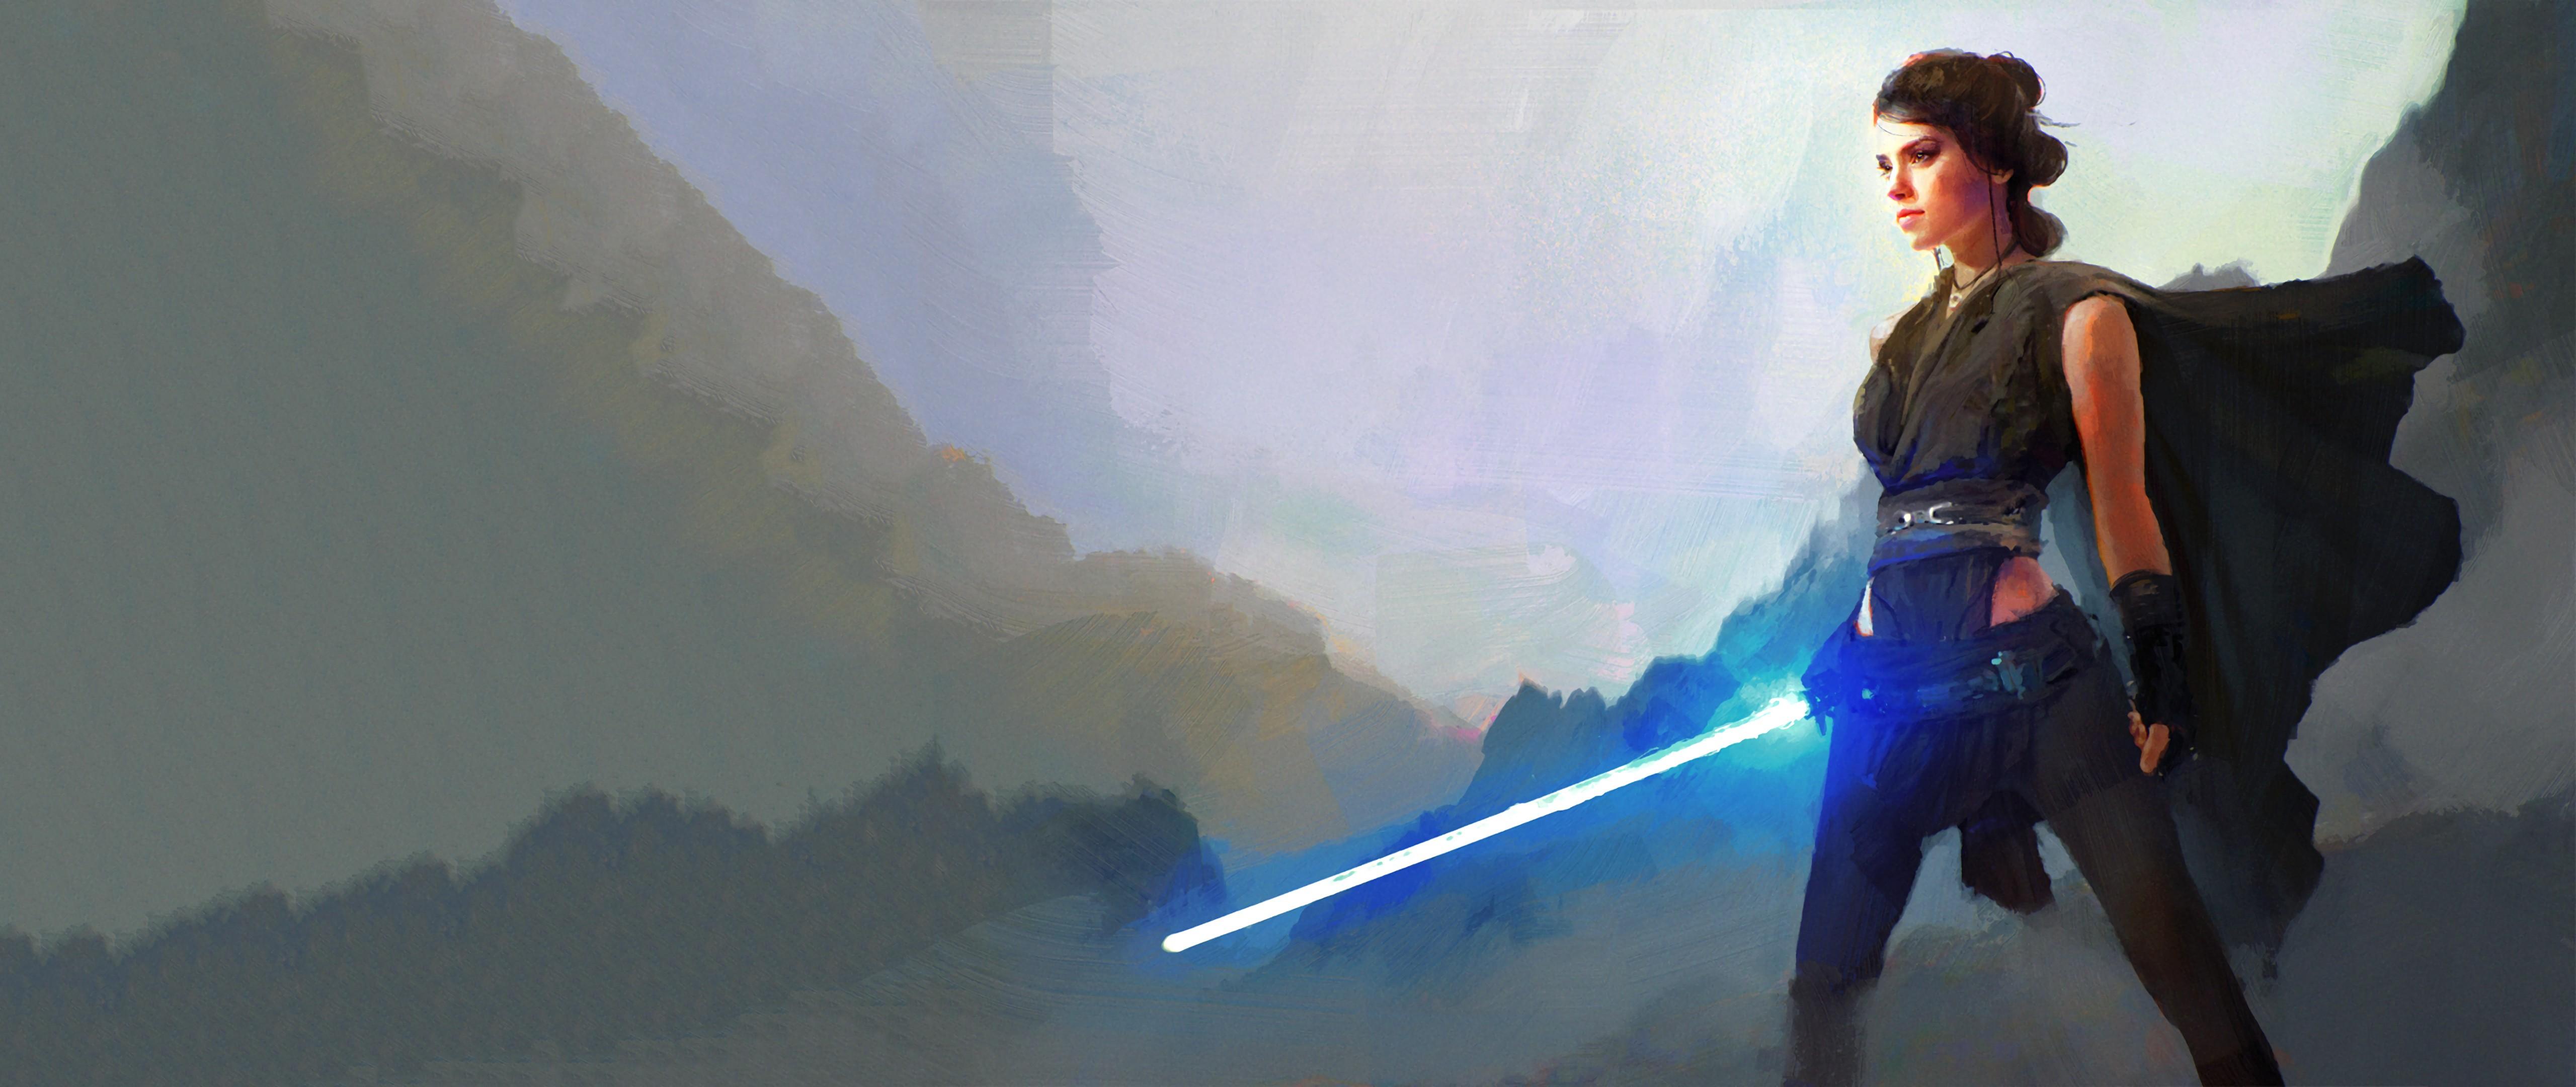 Rey Star Wars Jedi Lightsaber Artistic Woman Warrior Daisy Ridley Star Wars The Last Jedi 5120x2160